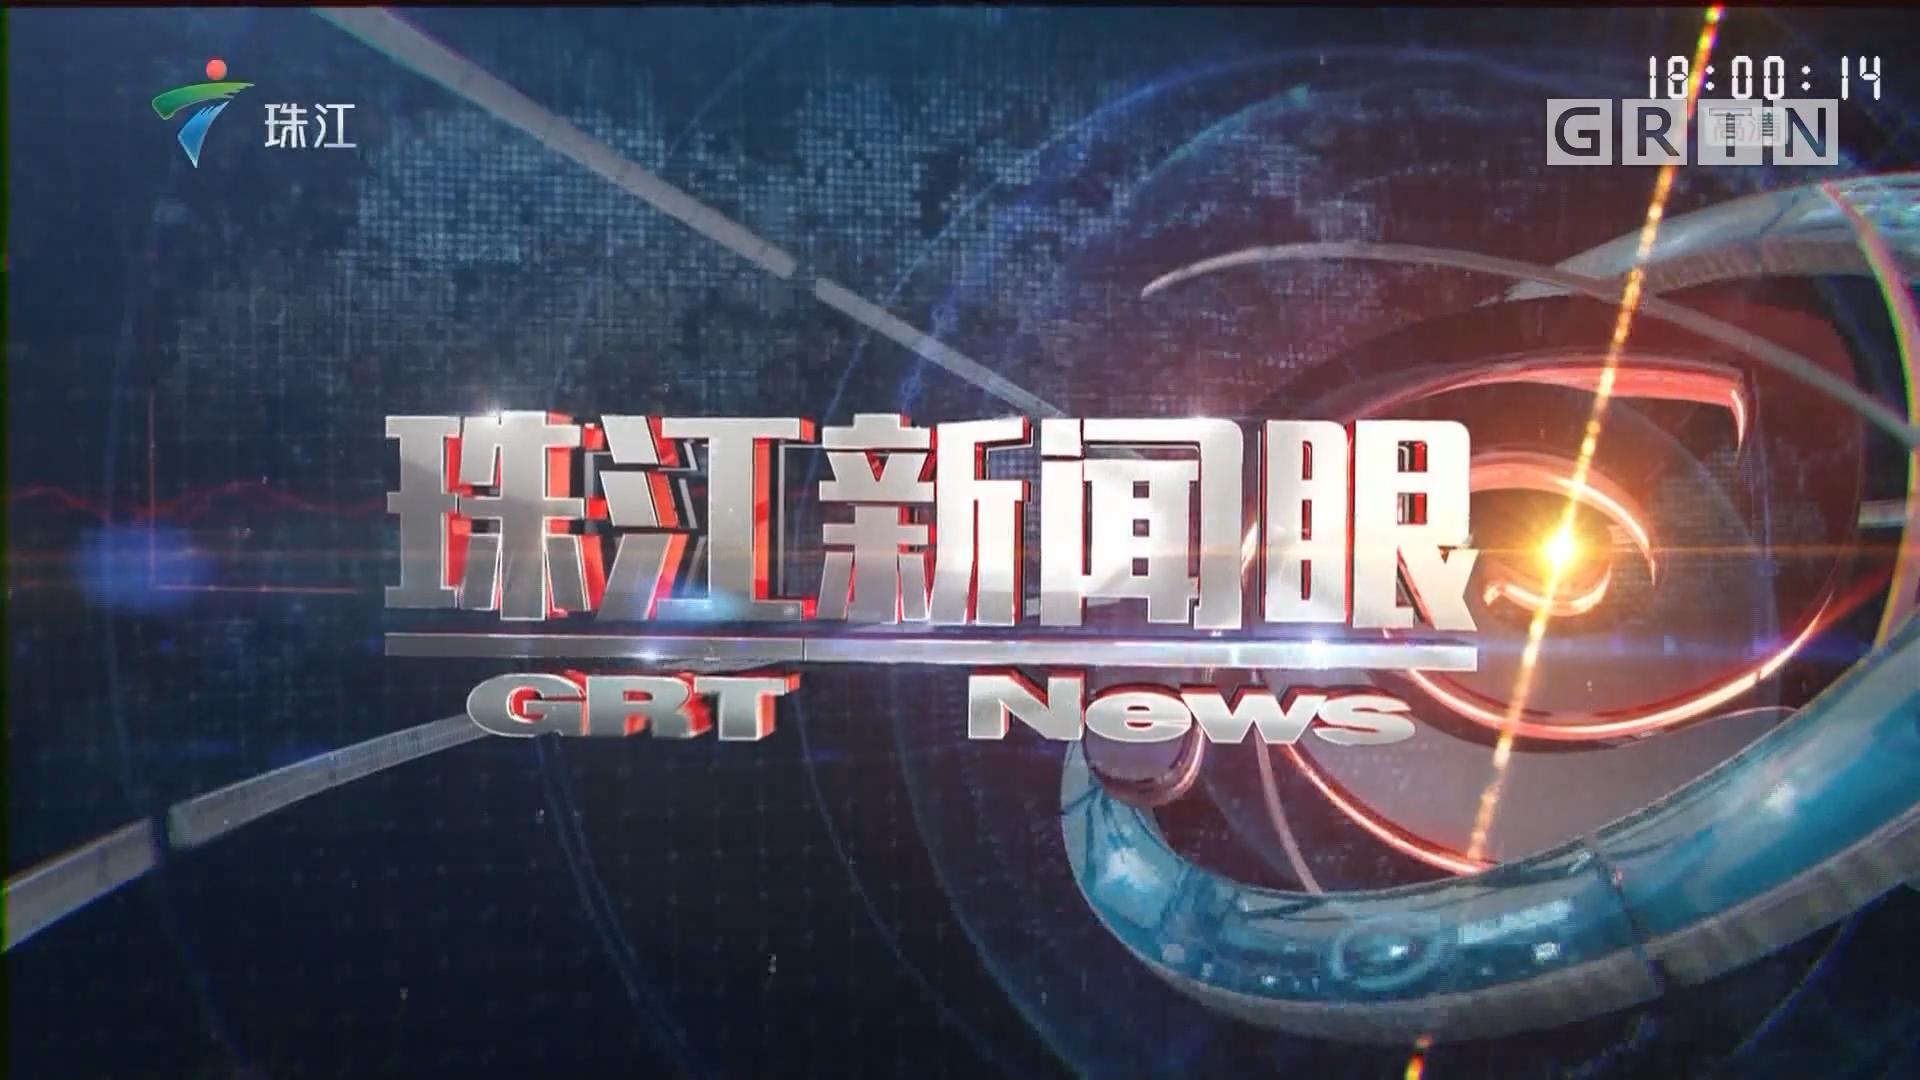 [HD][2019-03-31]珠江新闻眼:虎门二桥助力粤港澳大湾区协调发展